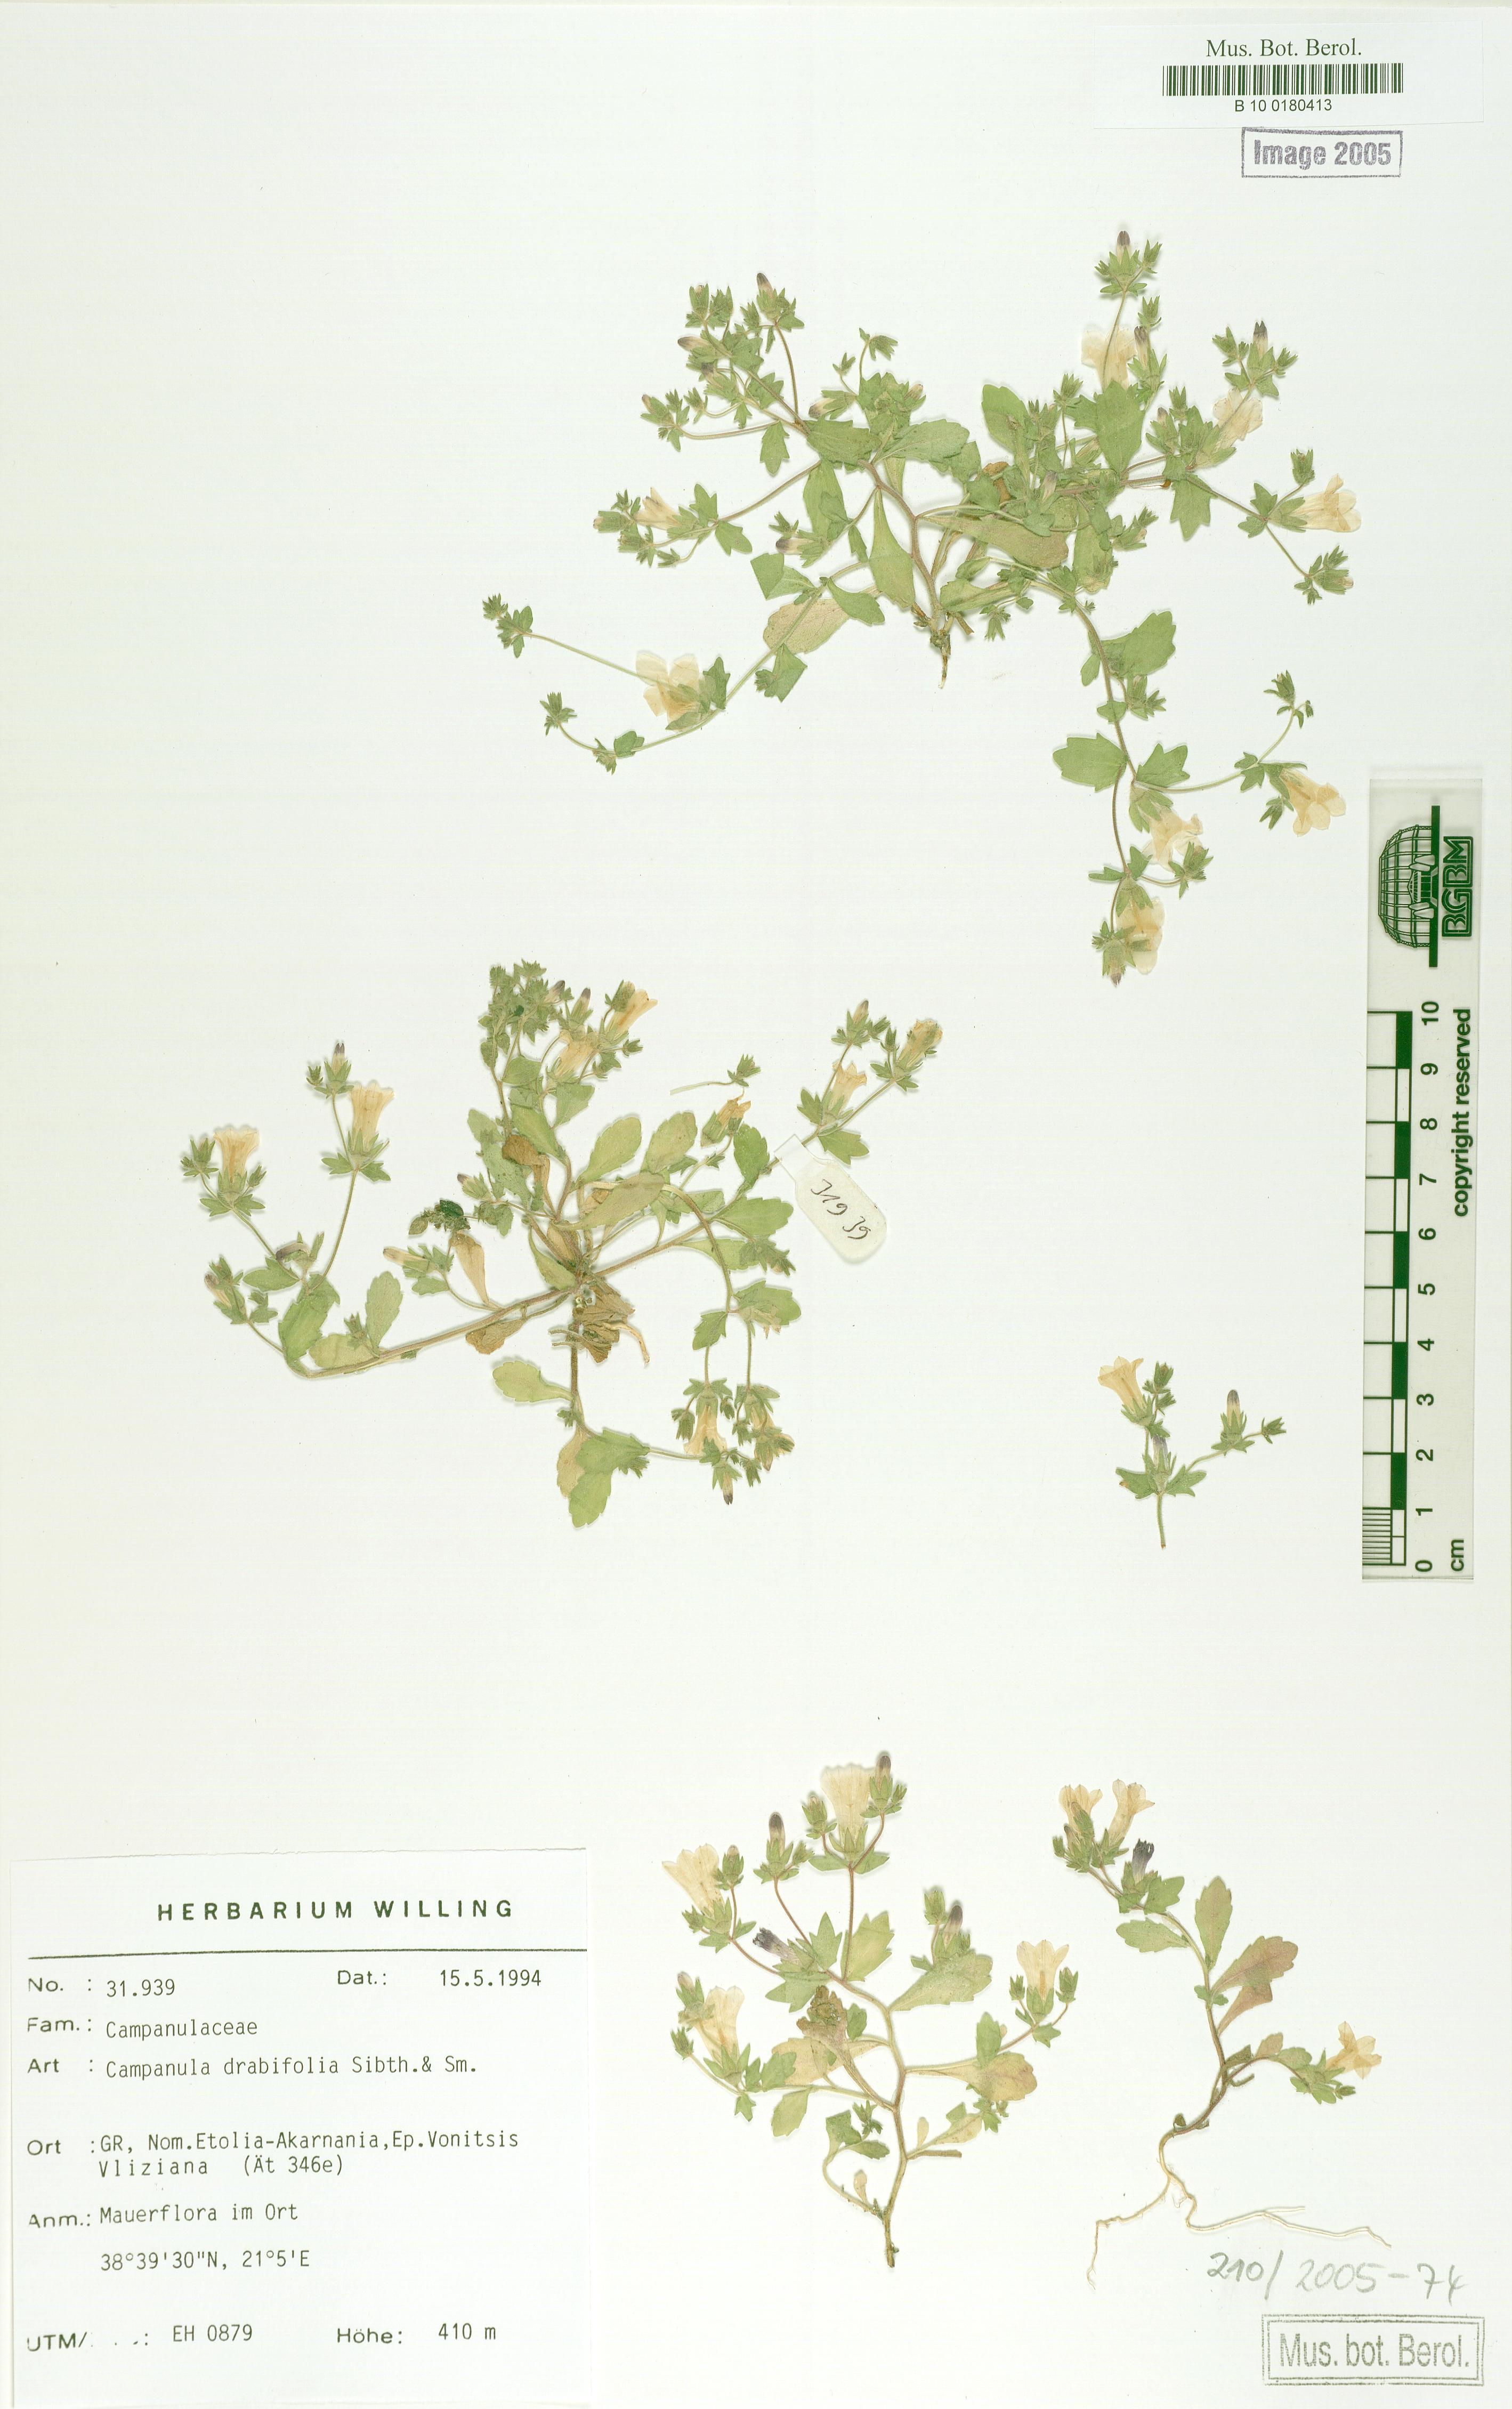 http://ww2.bgbm.org/herbarium/images/B/10/01/80/41/B_10_0180413.jpg